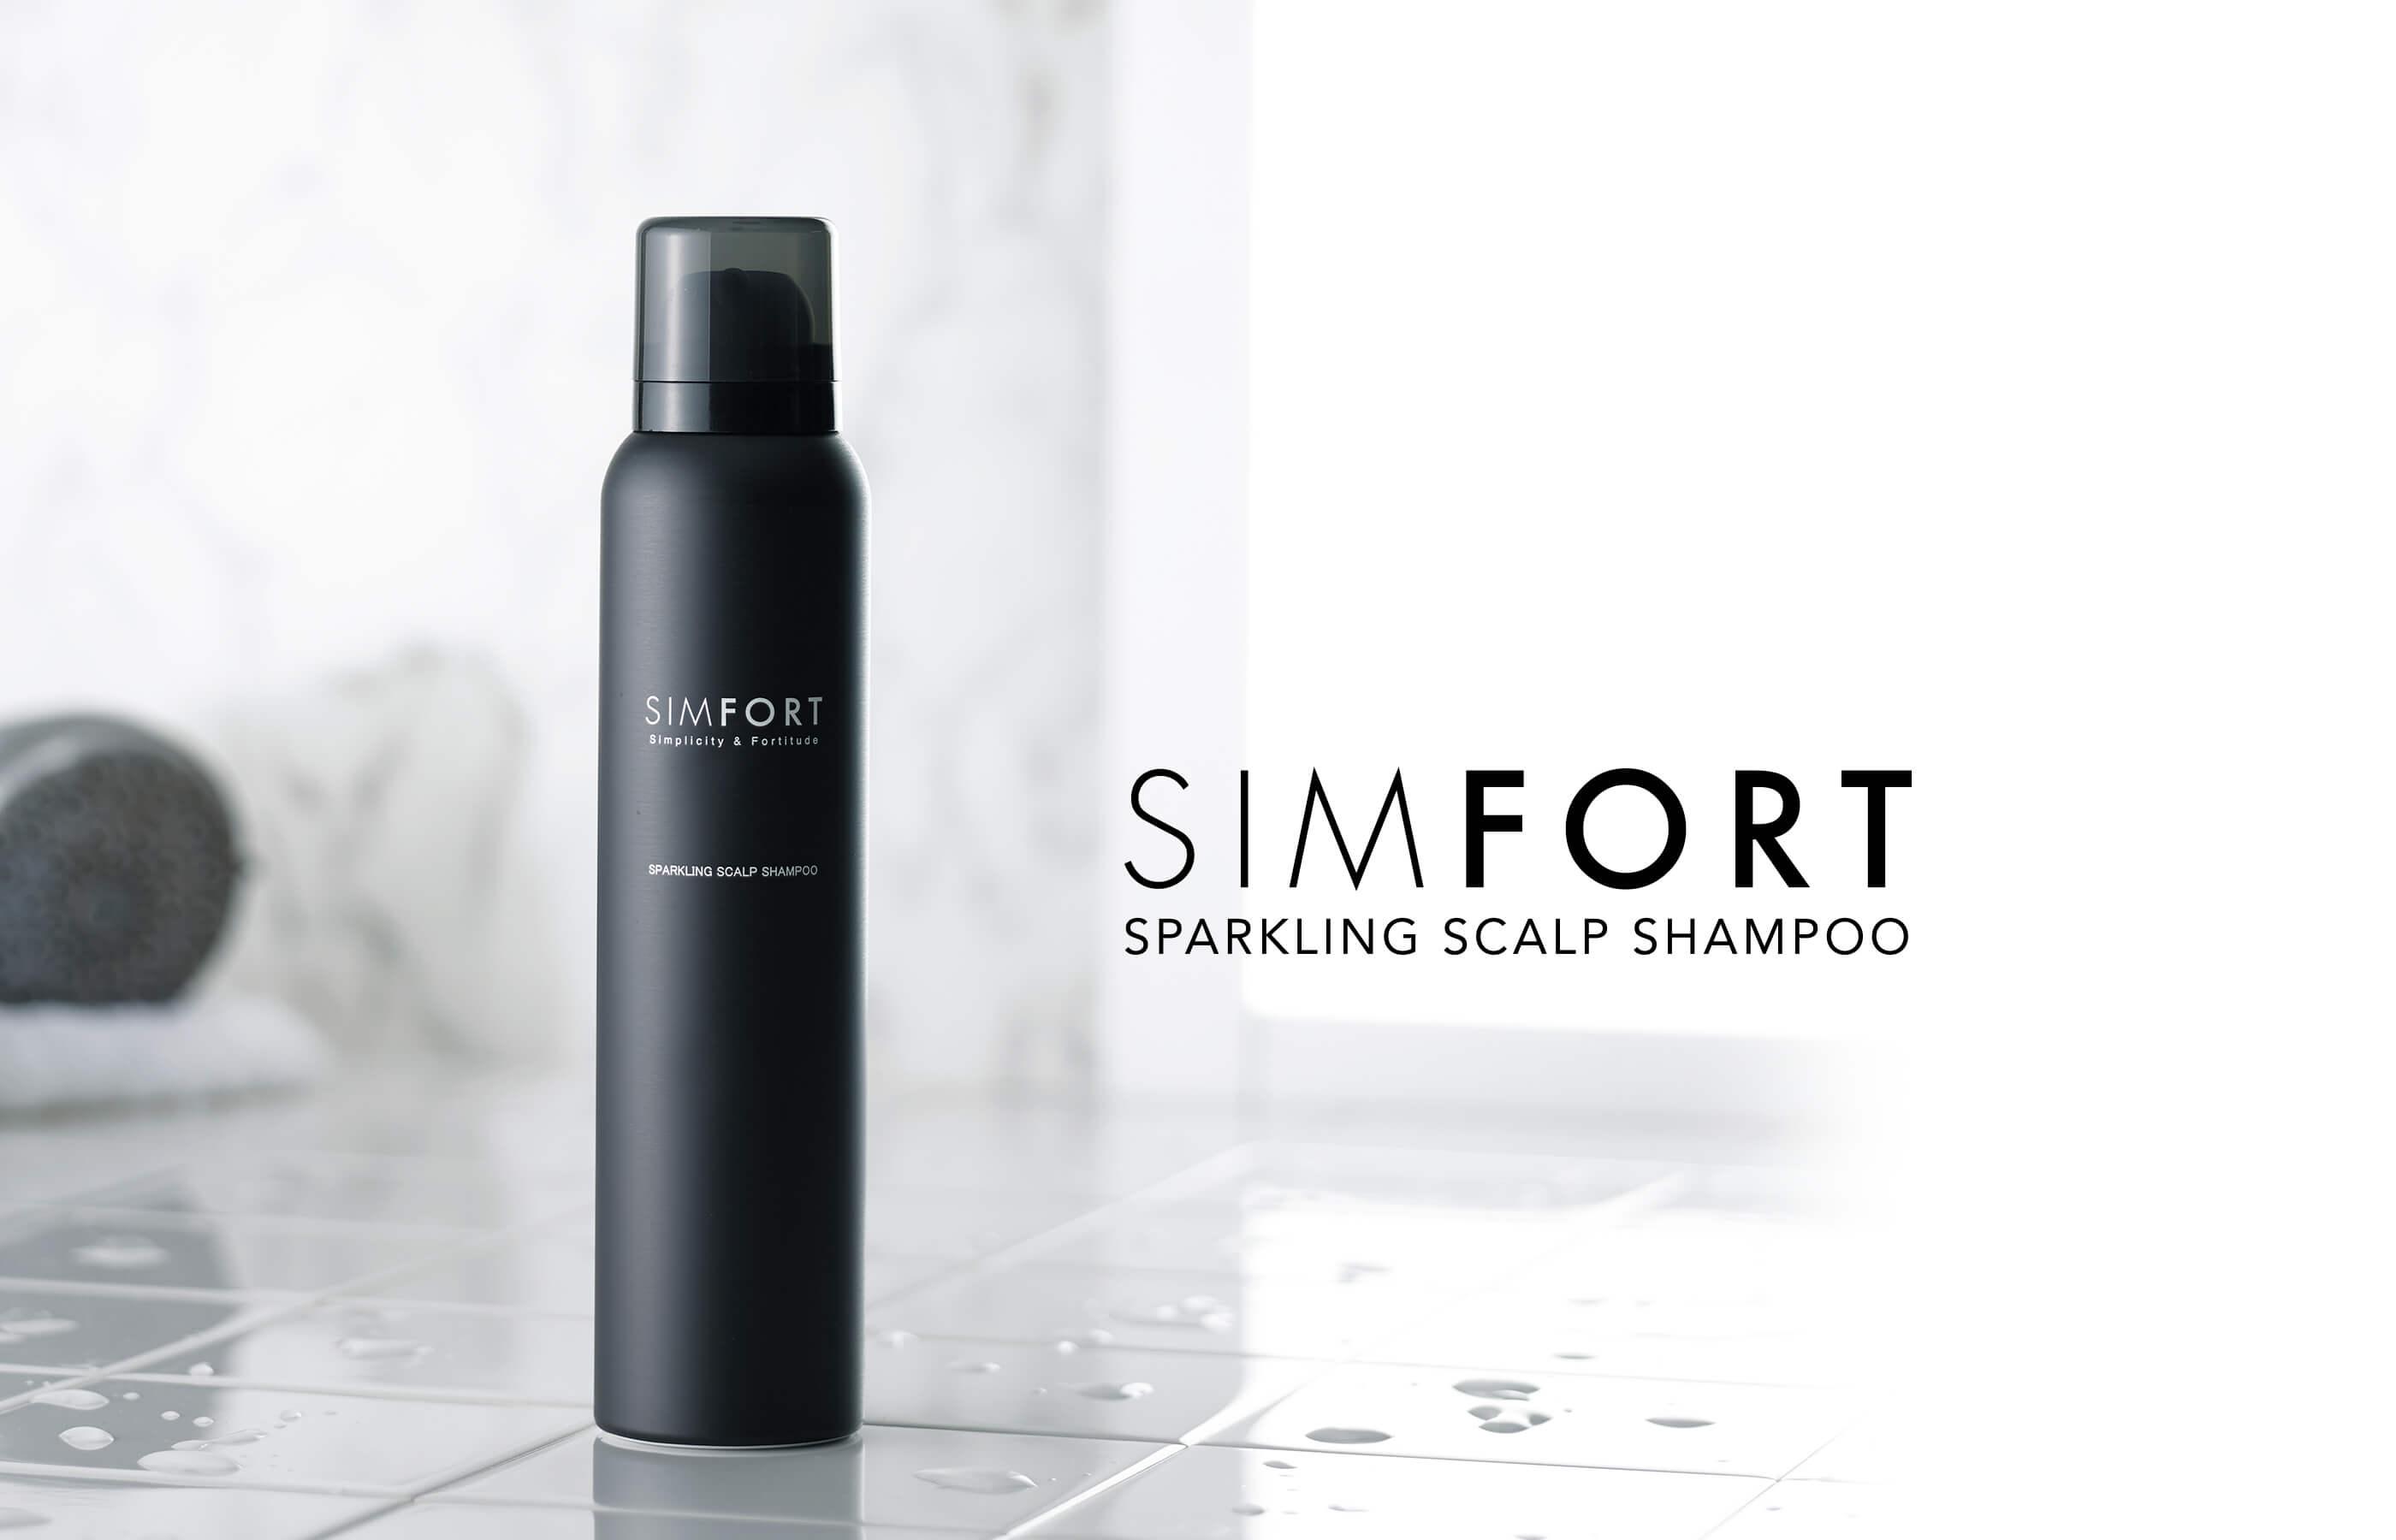 SIMFORT SPARKLING SCALP SHAMPOO